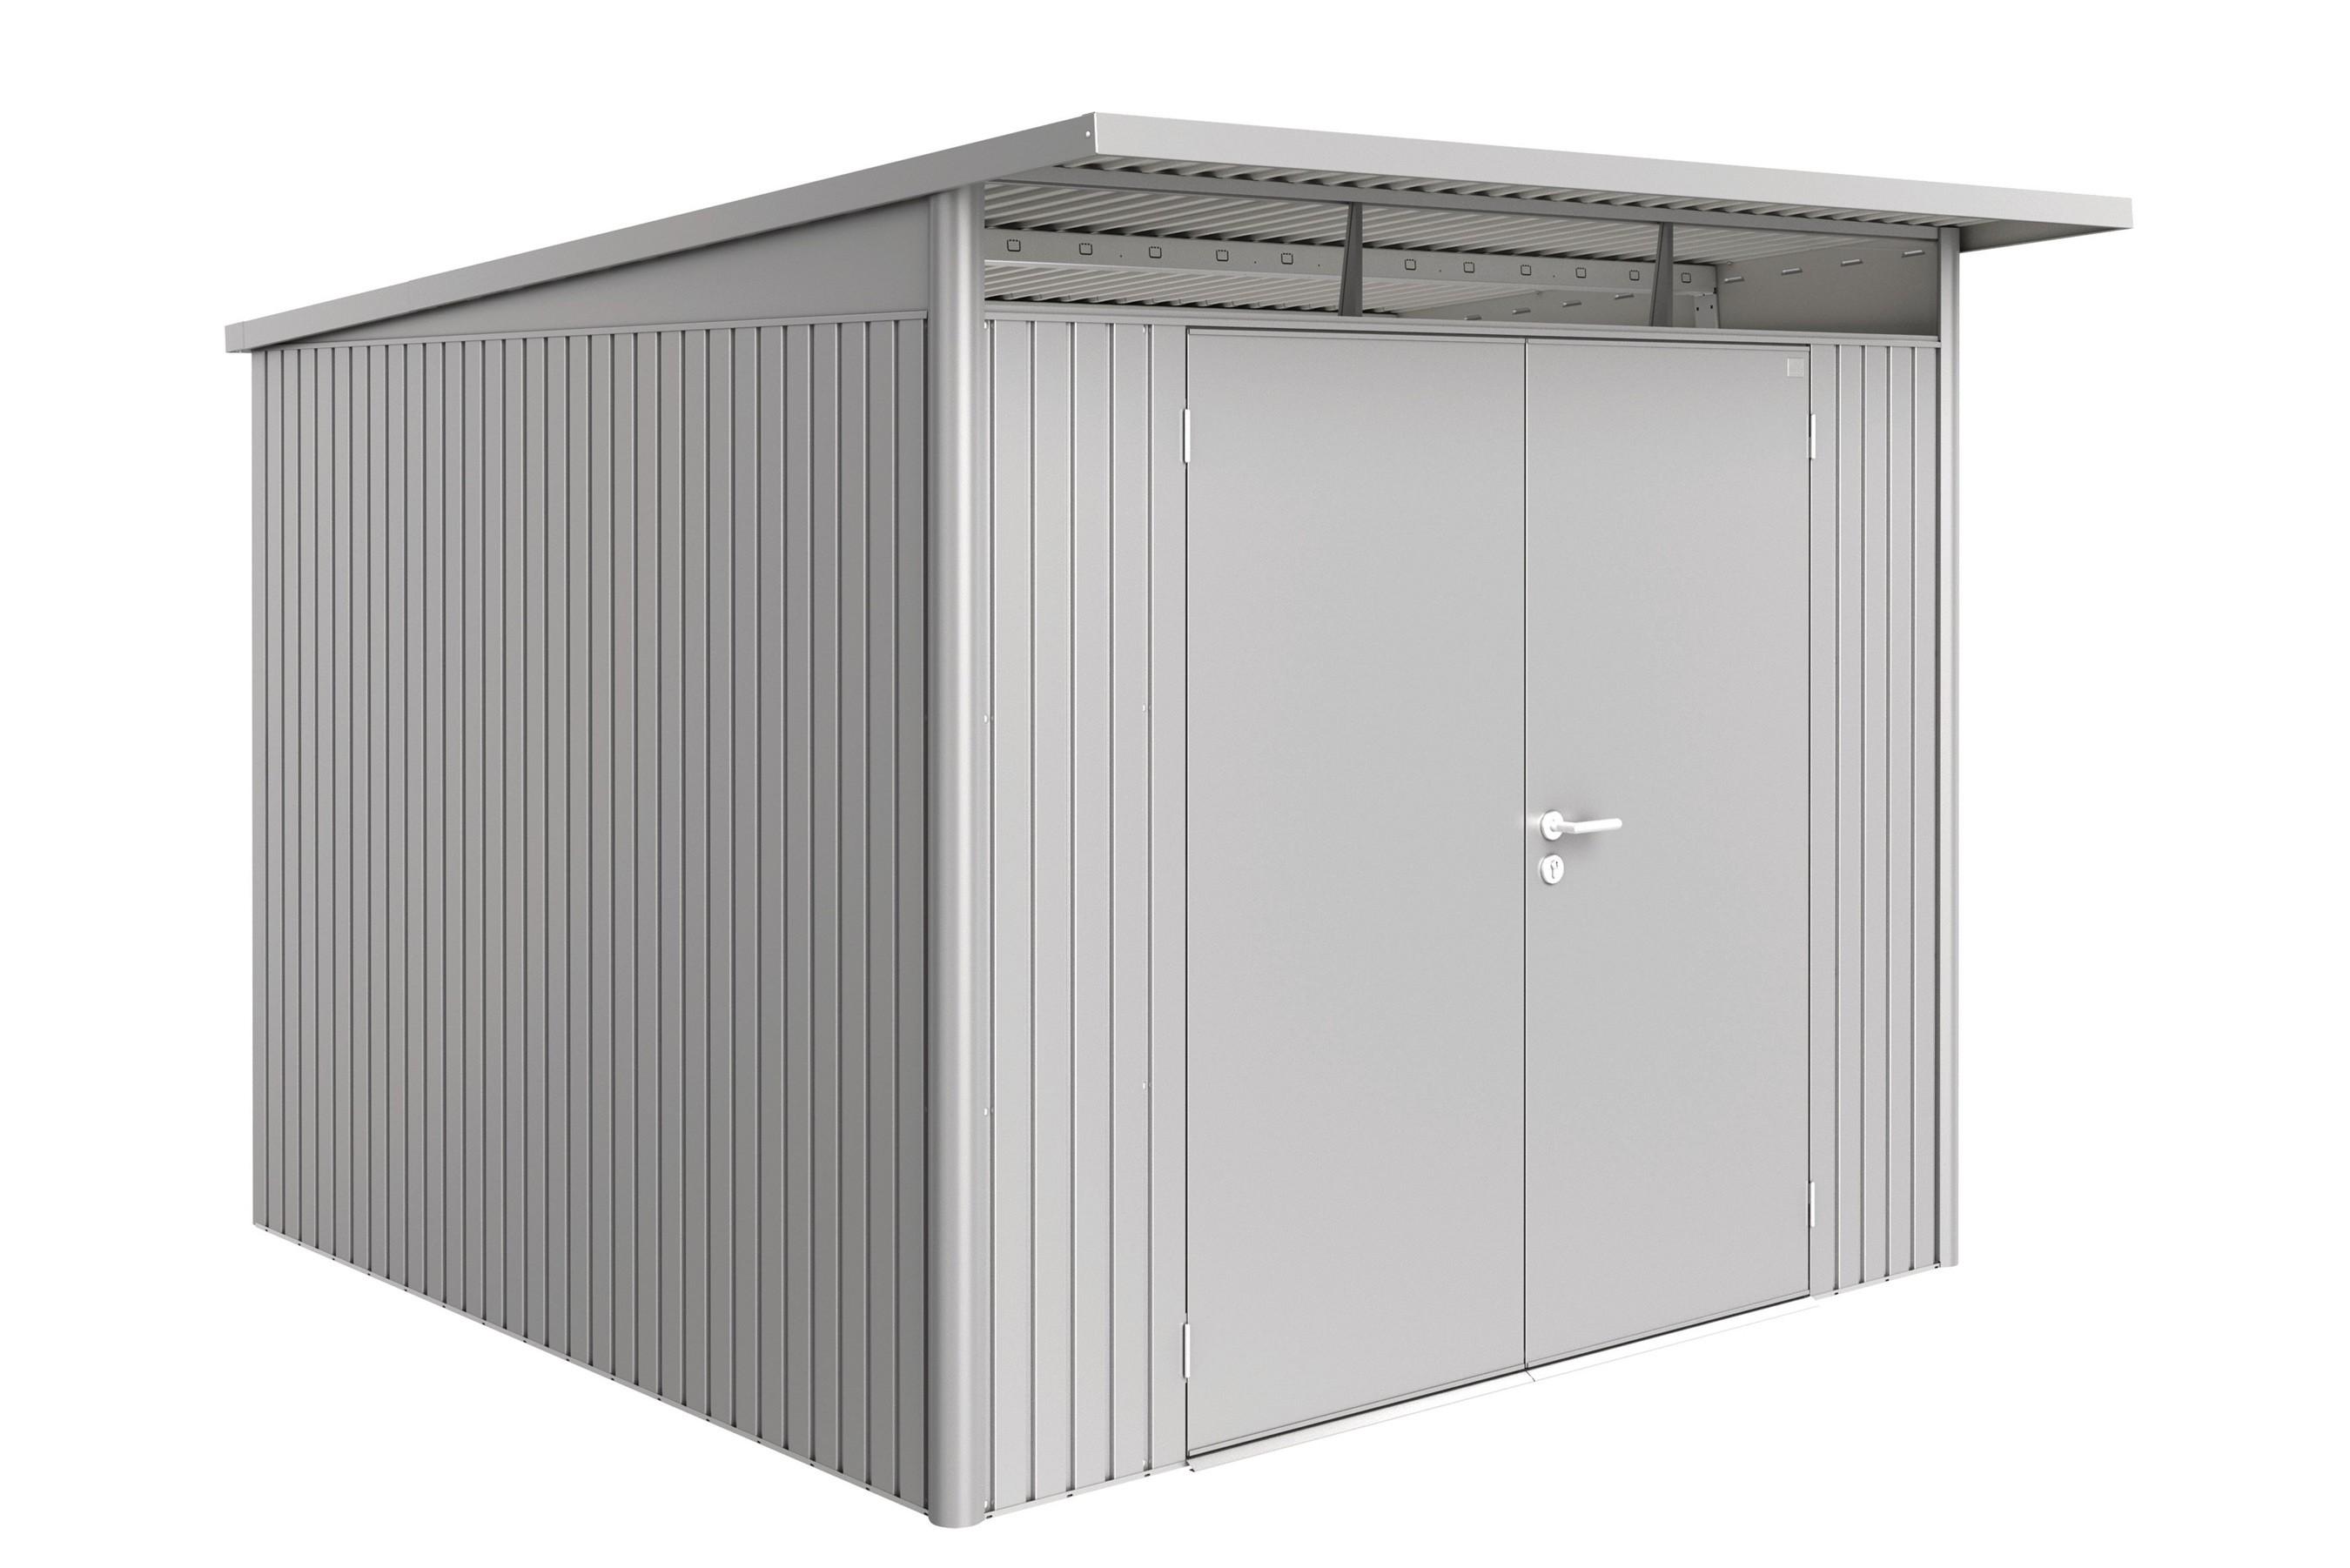 Gerätehaus Biohort AvantGarde Gr. XL silber-metallic DT 260x300cm Bild 1